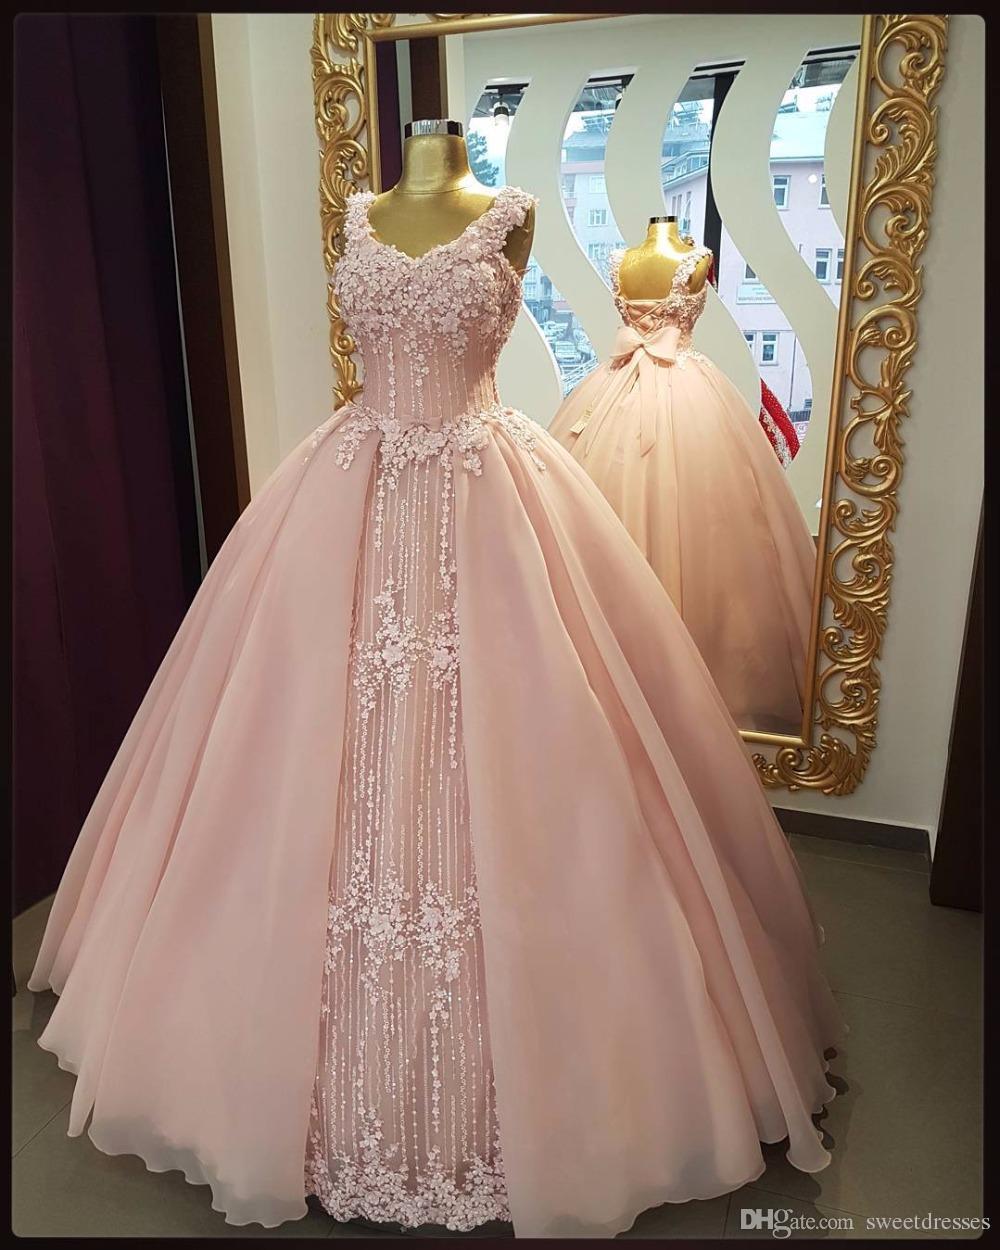 Vestido de novia de la boda de los vestidos de boda de la gasa del V-Cuello del vestido de boda de la novia